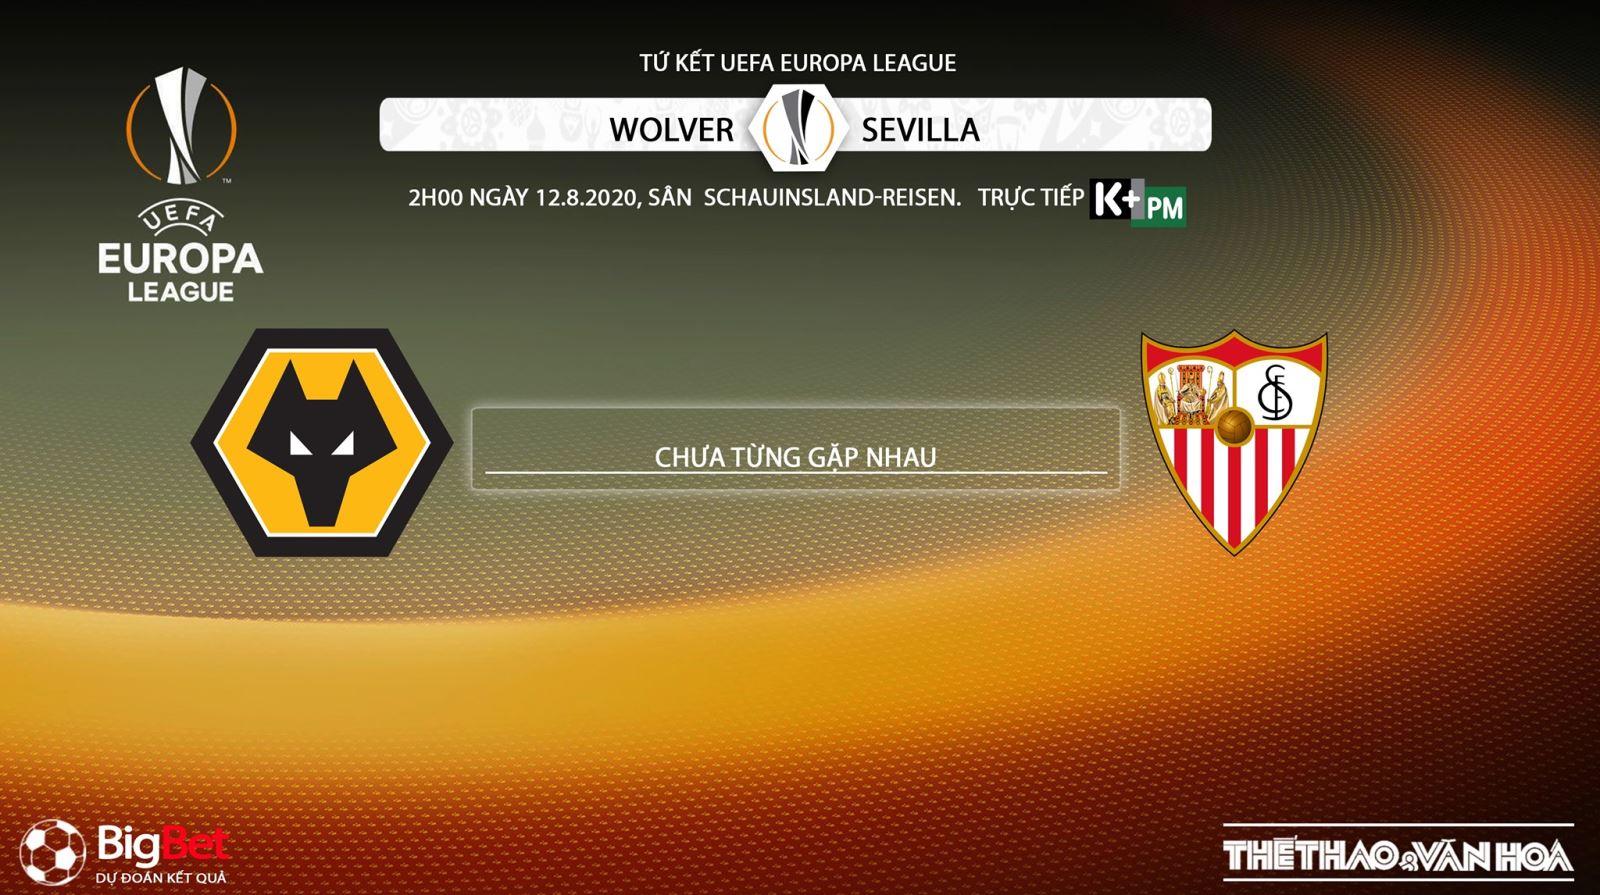 Wolvesvs Sevilla, trực tiếp Wolvesvs Sevilla , soi kèo bóng đá, kèo bóng đá, nhận định Wolvesvs Sevilla, nhận định Wolvesvs Sevilla, trực tiếp bóng đá